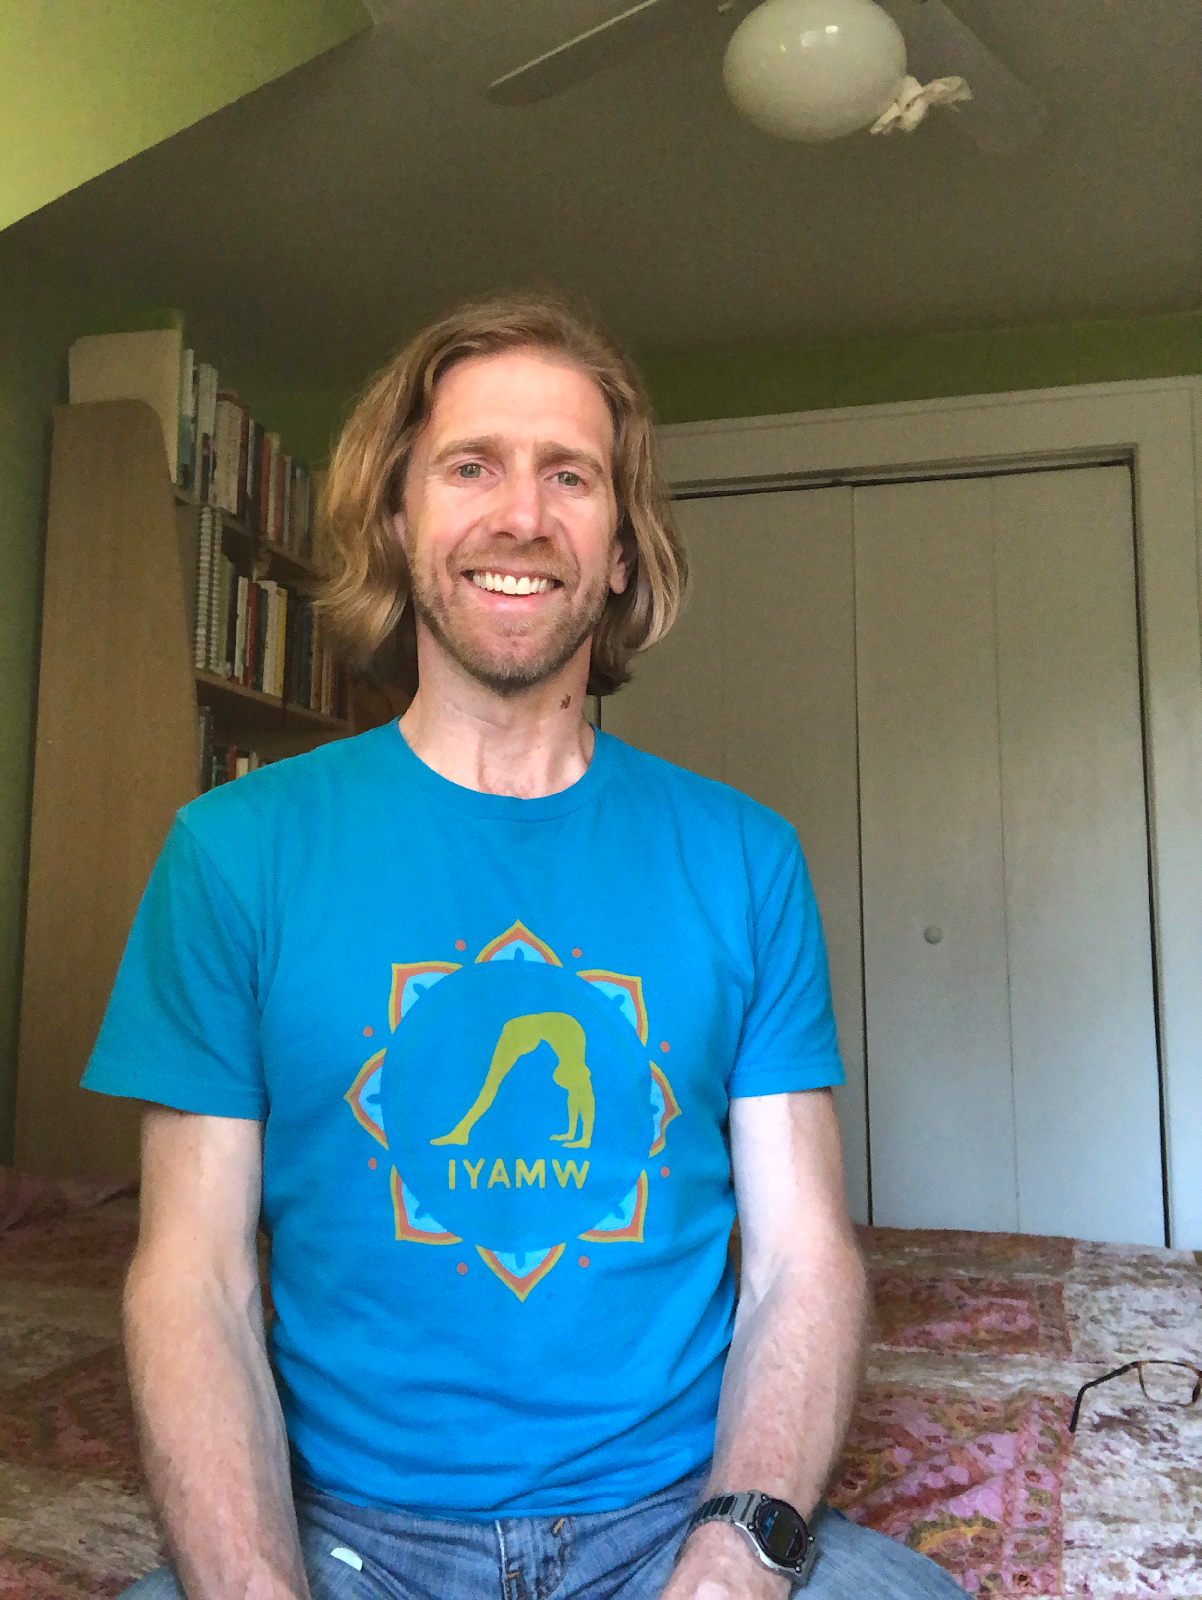 Chris Briney smiling with a blue shirt